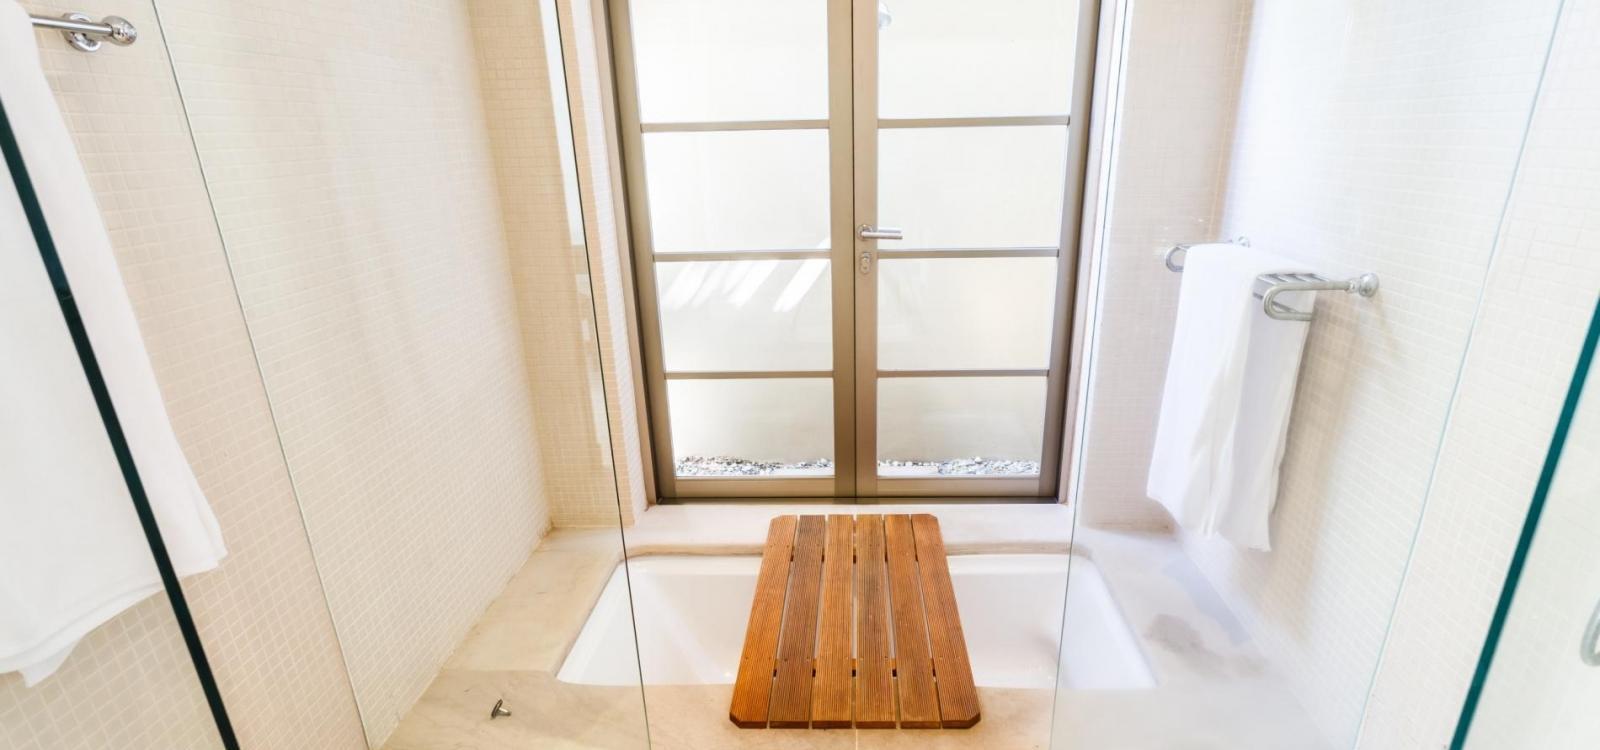 TR105 - Private pool 3 bedroom villa in Bang Tao Residence